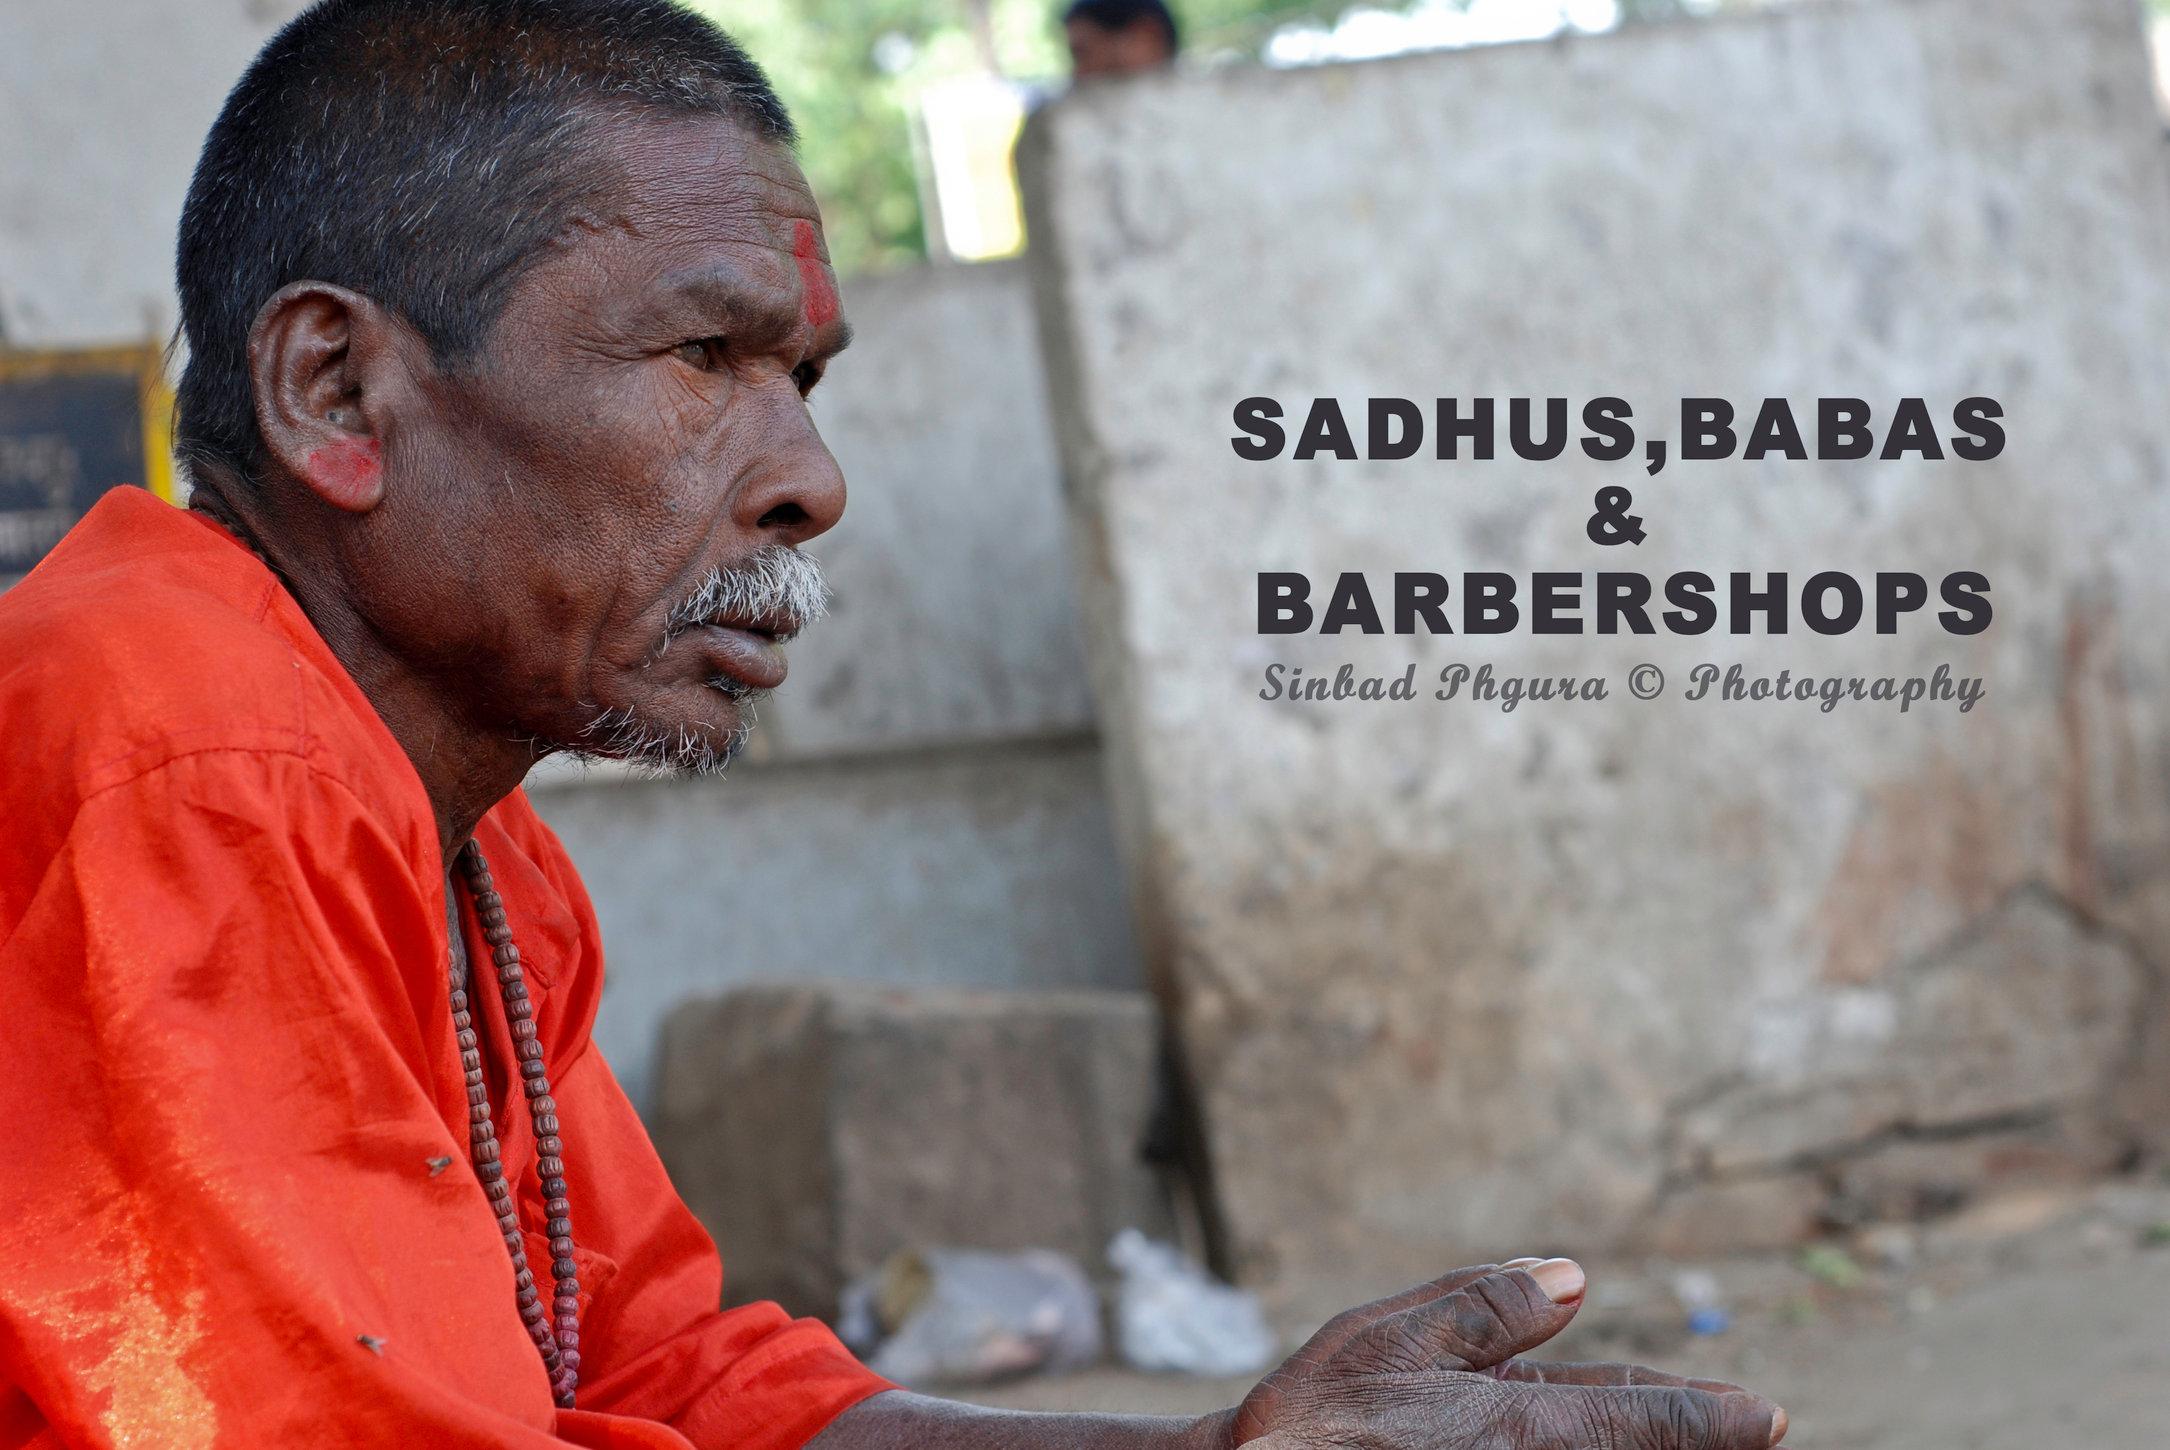 Sahdhus,Baba's & Barbershops